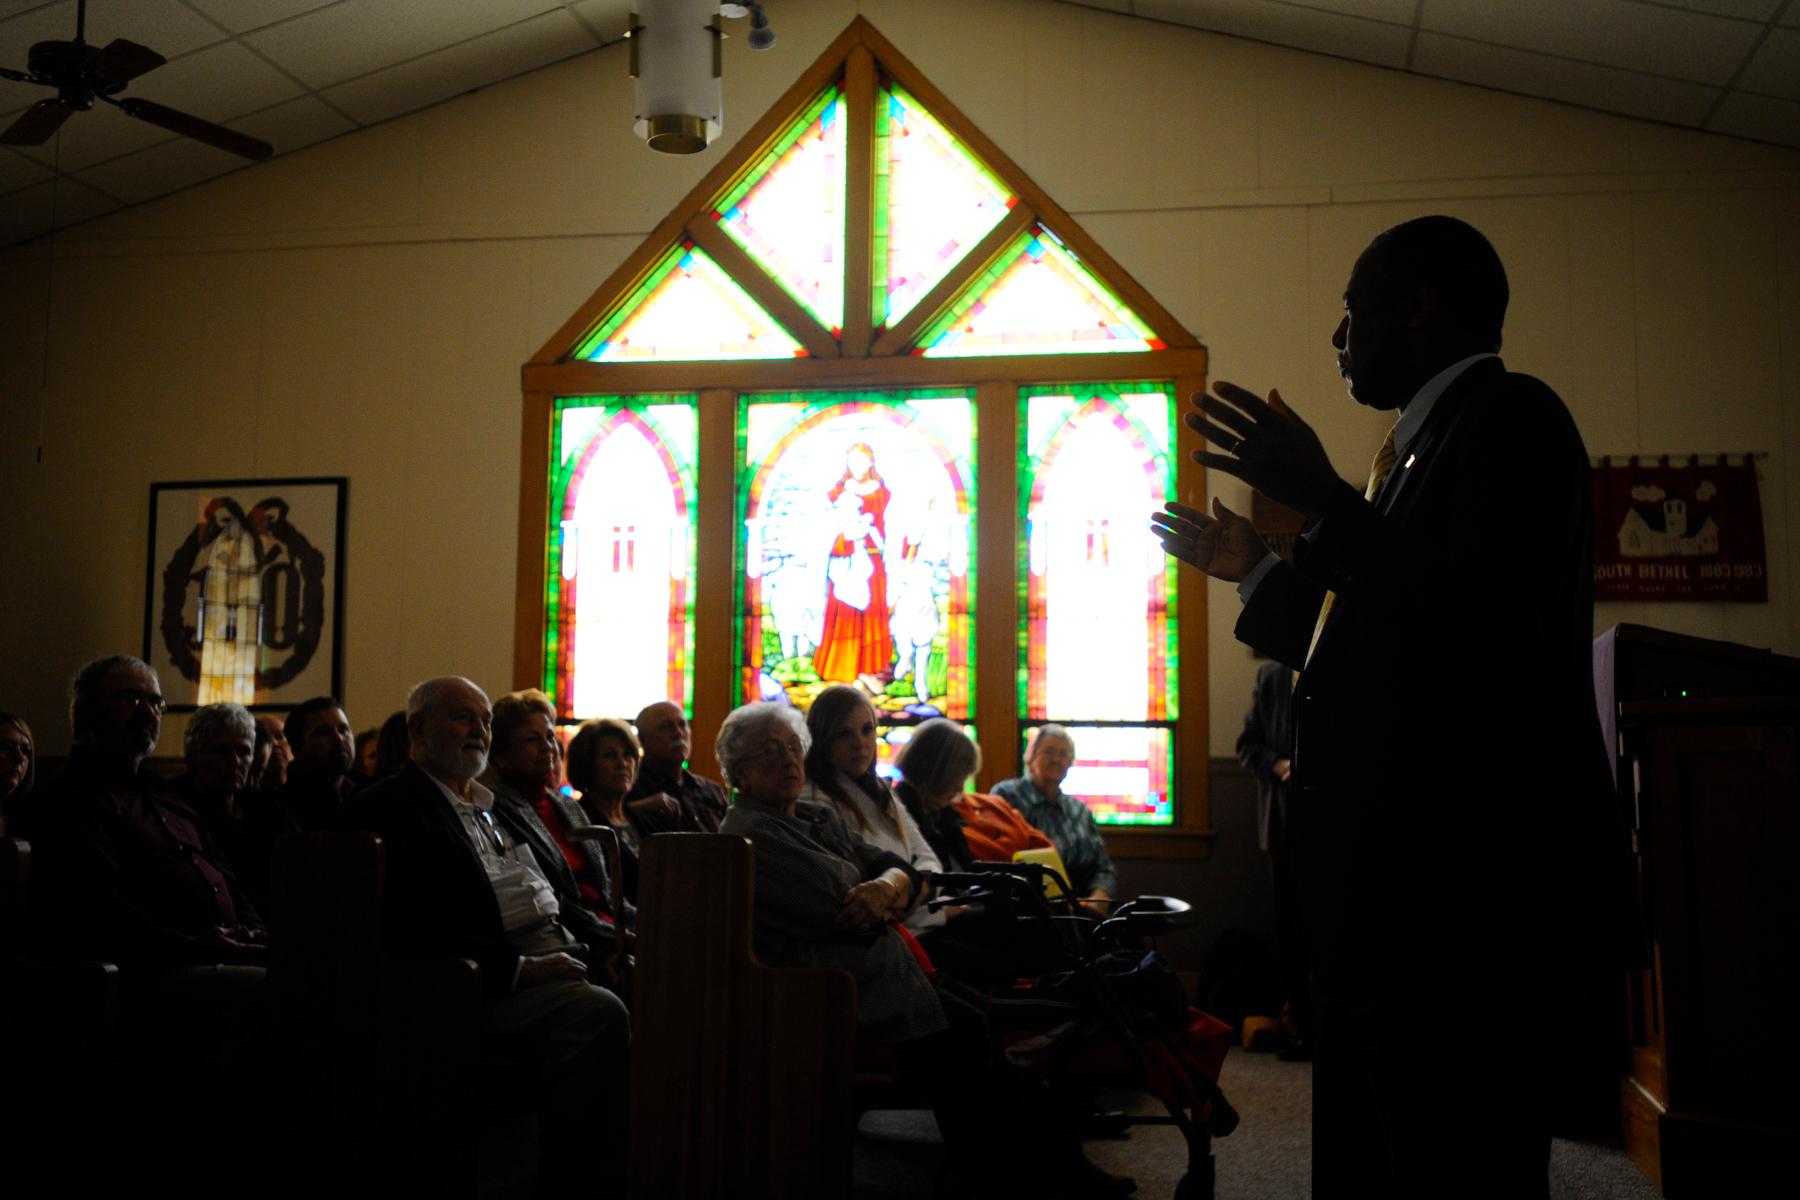 U.S. Republican presidential candidate Ben Carson speaks at South Bethel Church in Tipton, Iowa November 22, 2015. REUTERS/Mark Kauzlarich